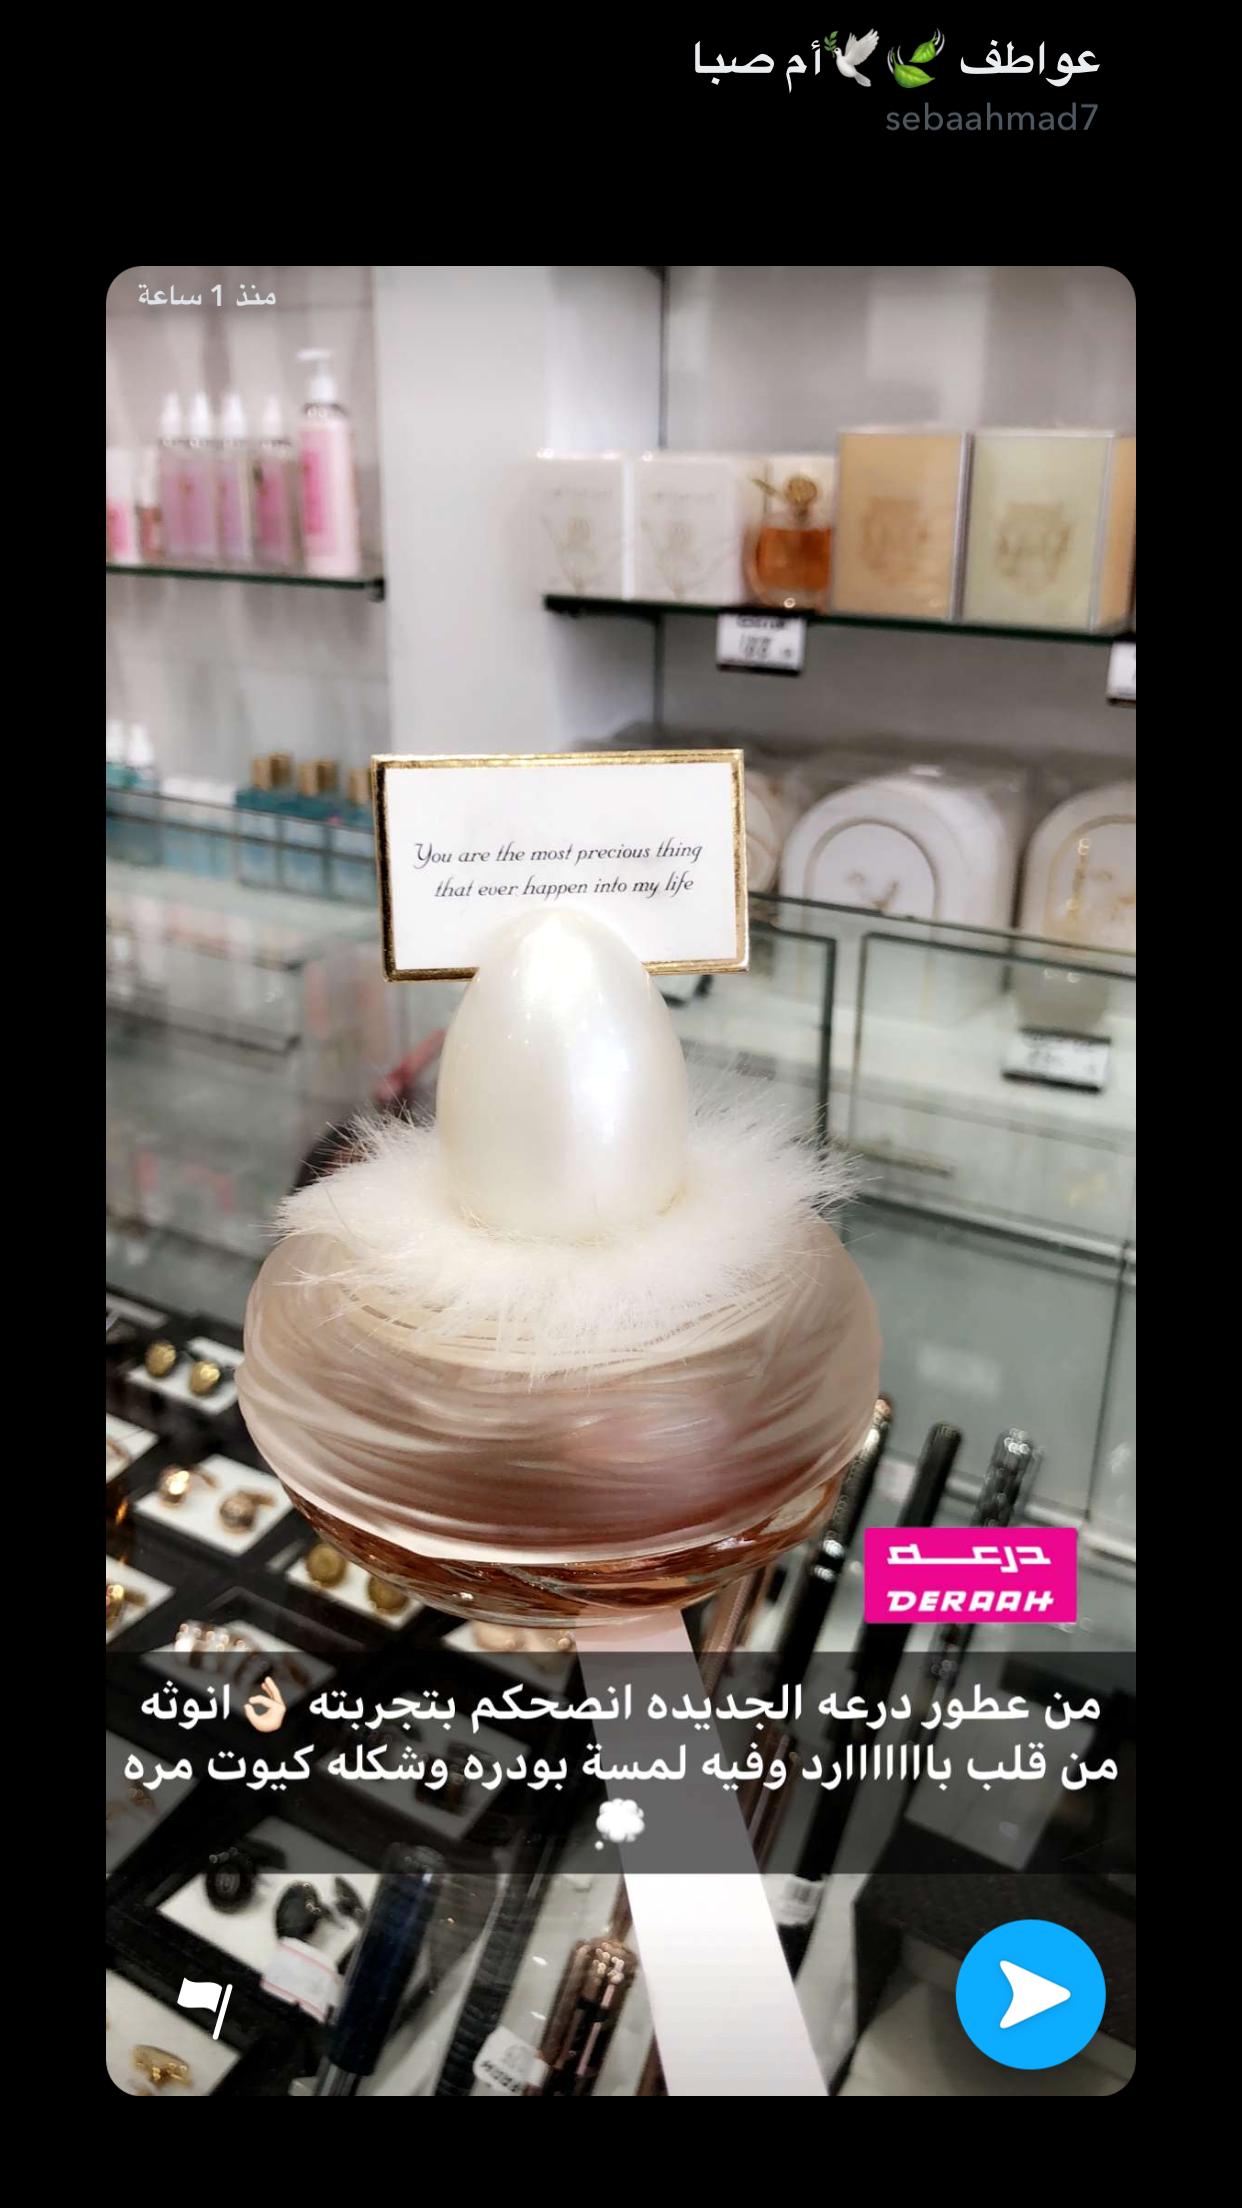 عطور درعه الانثوية الجديدة Perfume Scents Beauty Perfume Lovely Perfume